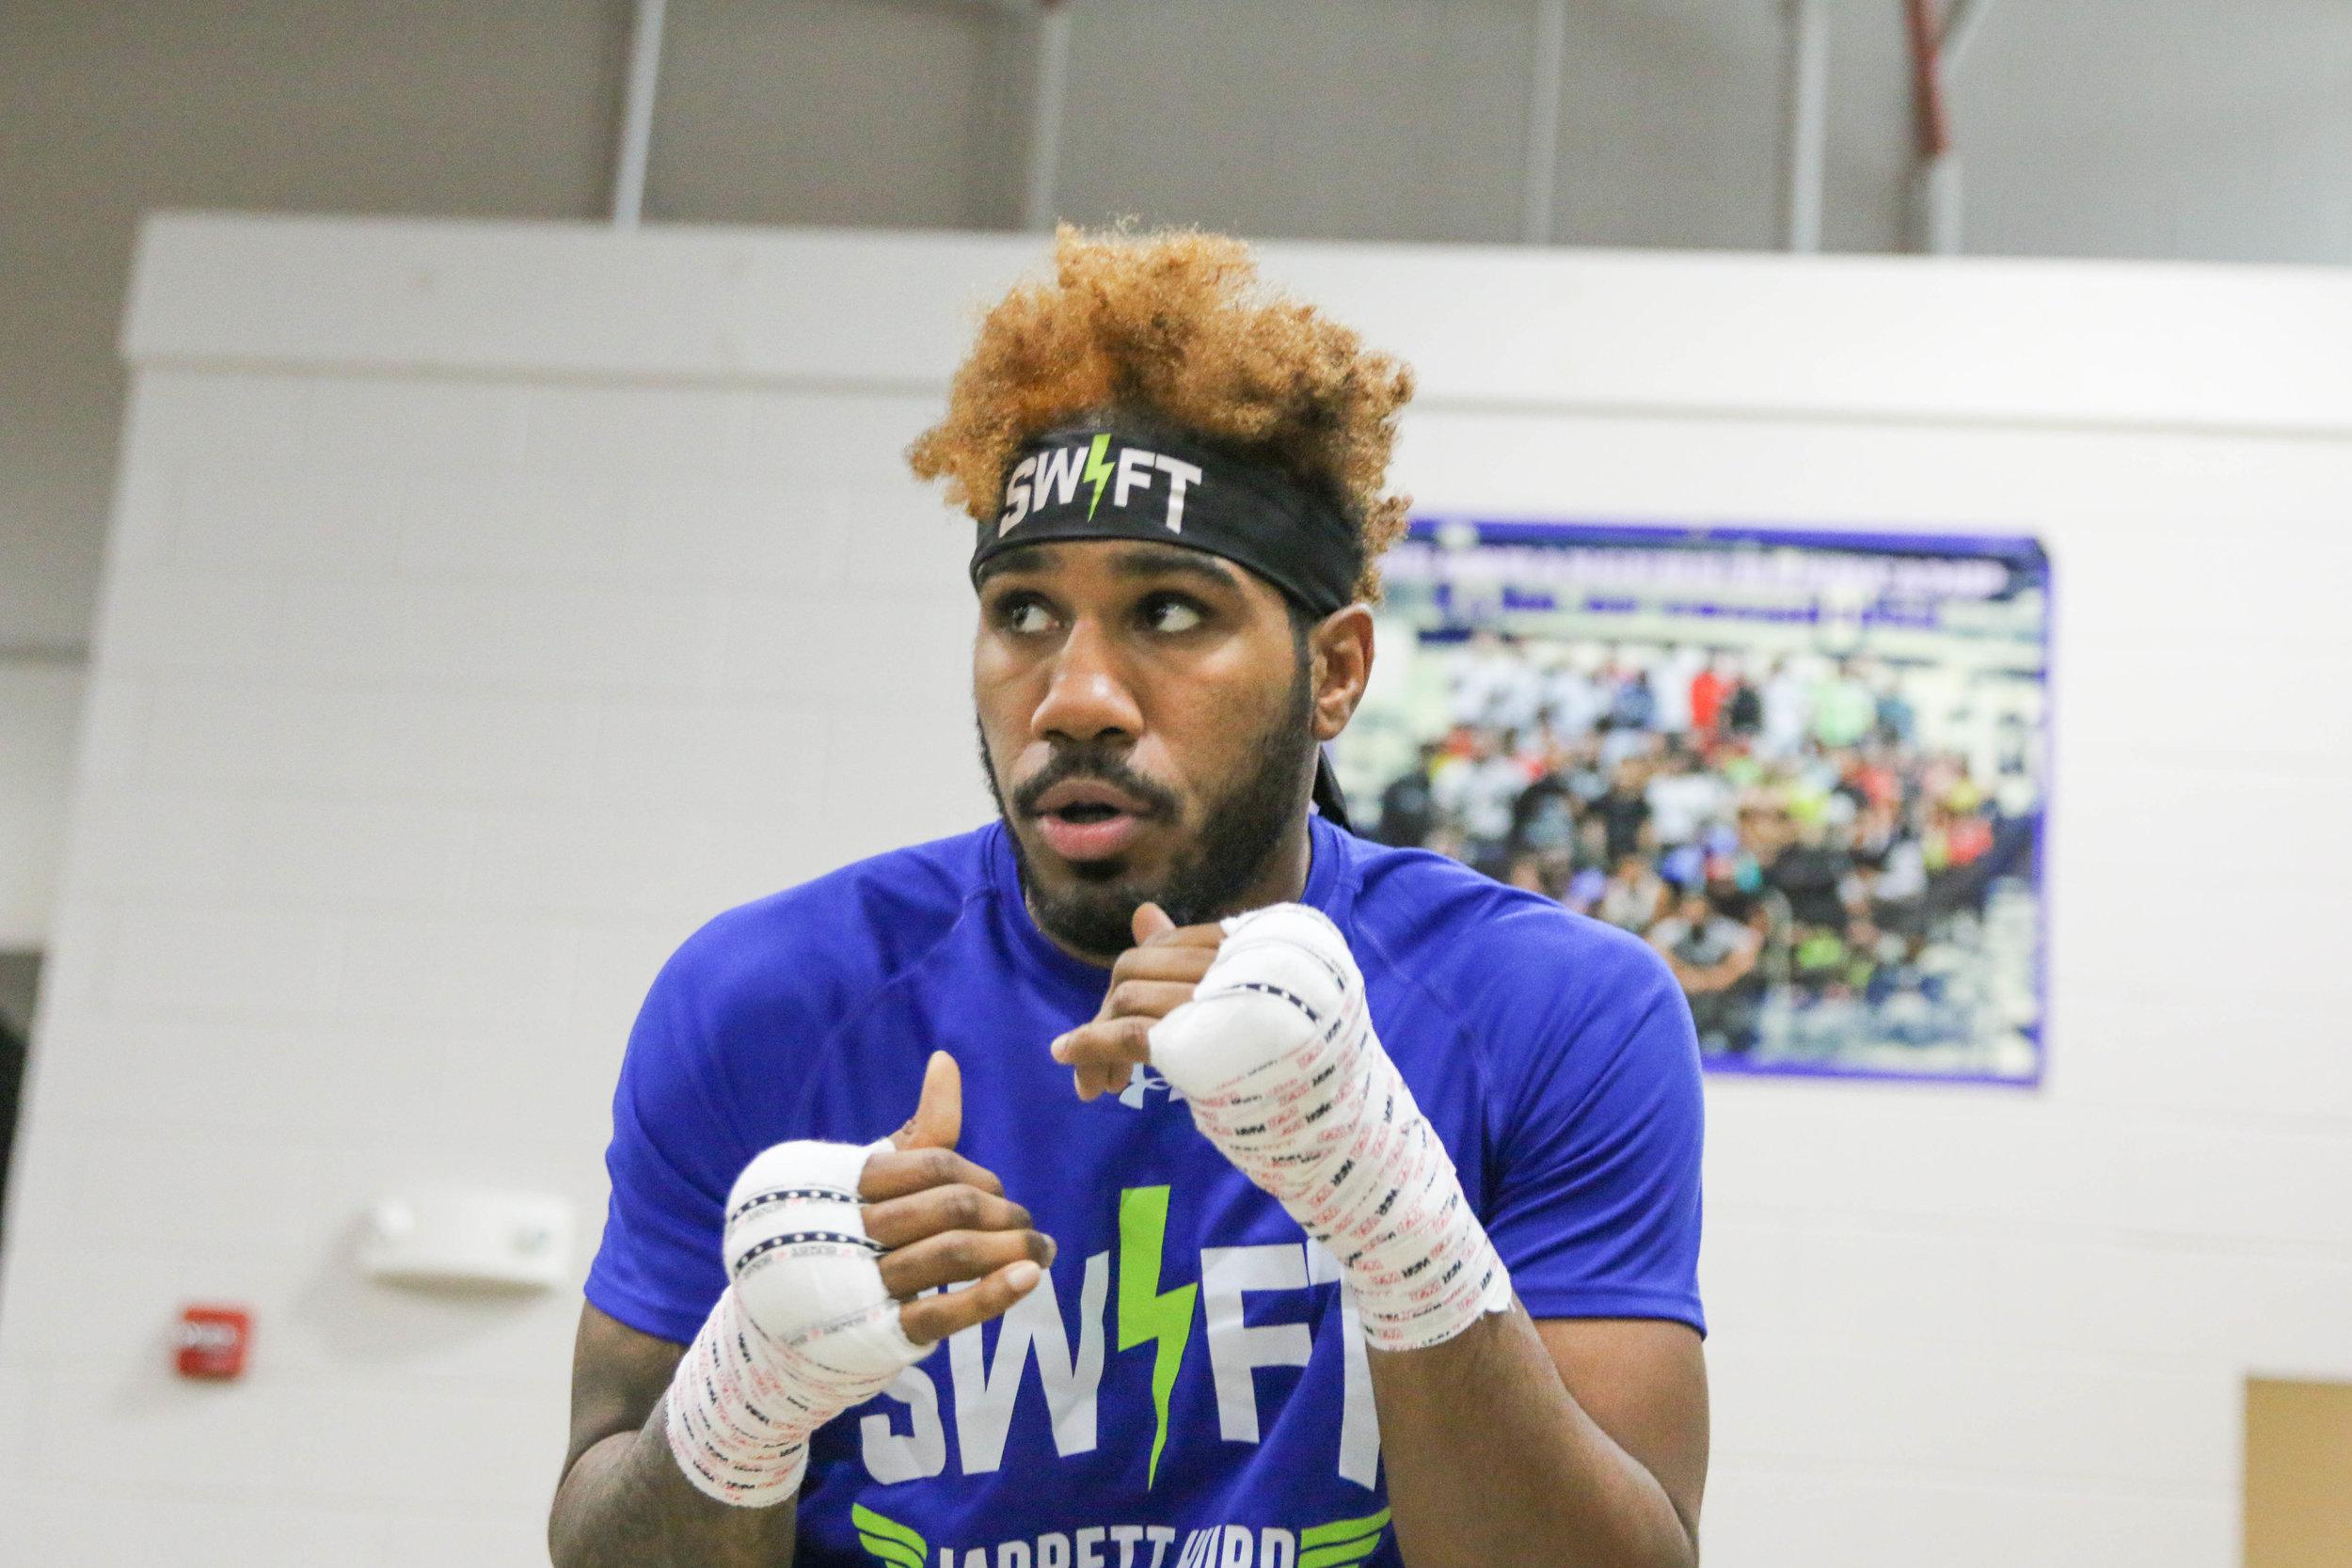 Jarrett Hurd Camp Visit_02_25_2017_Workout_Leo Wilson Jr. _ Premier Boxing Champions4.jpg